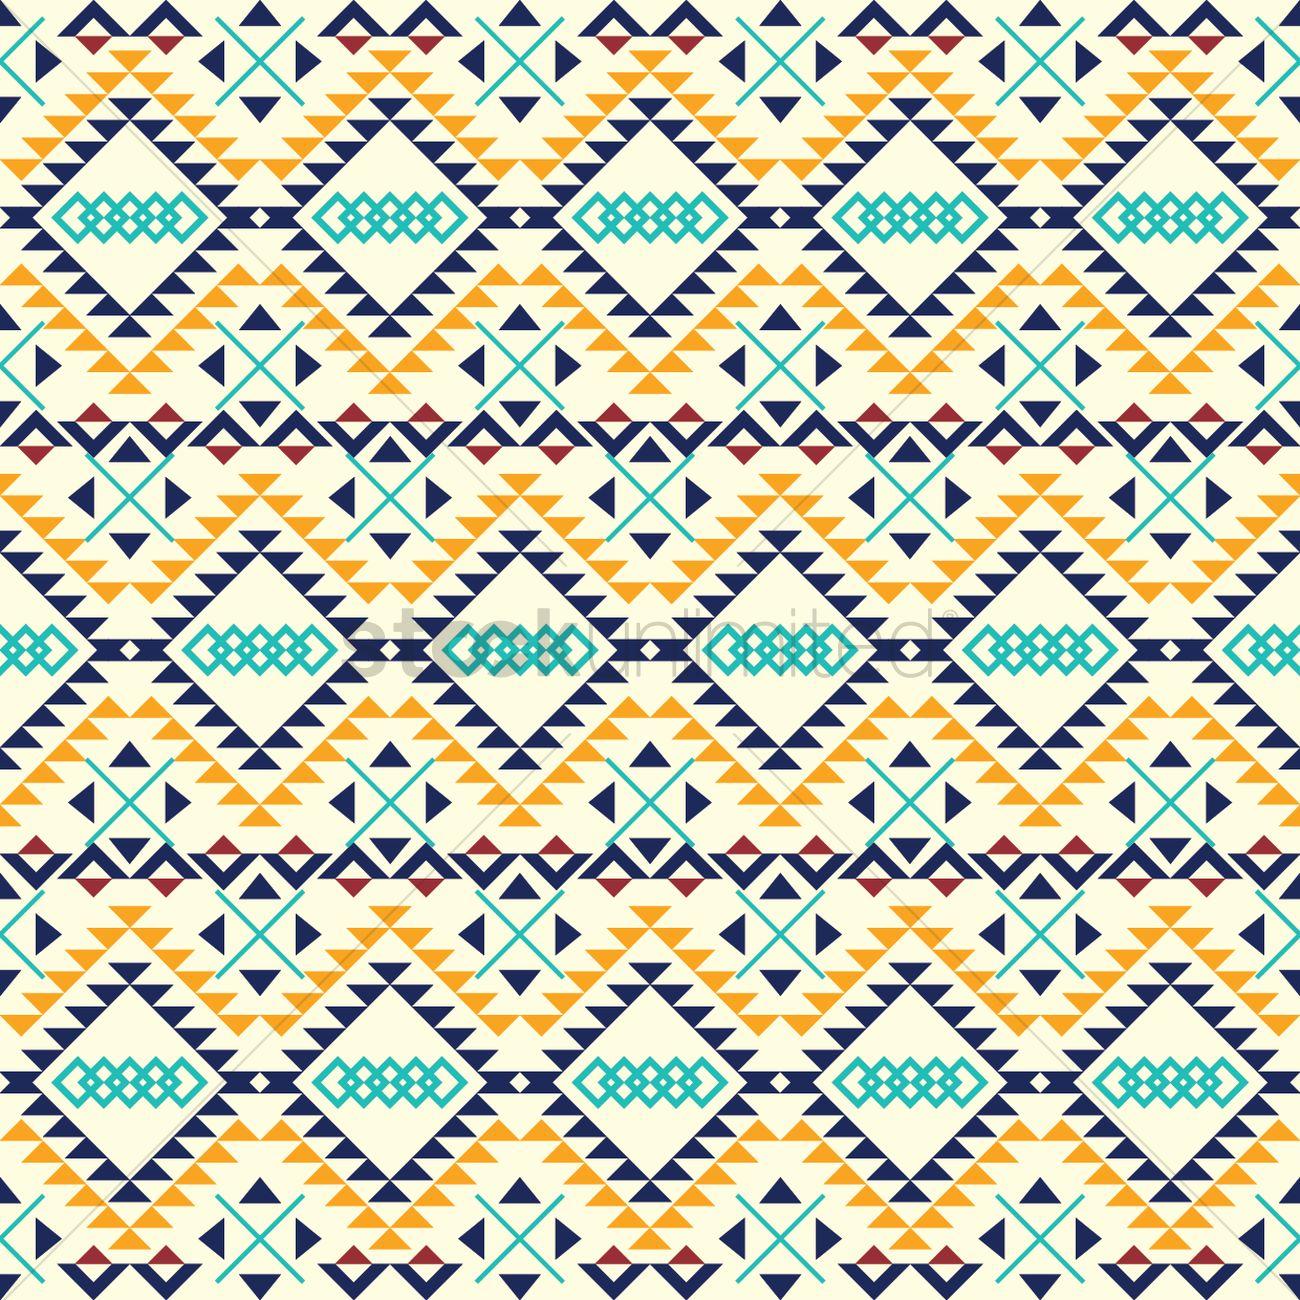 aztec background design vector image 2011953